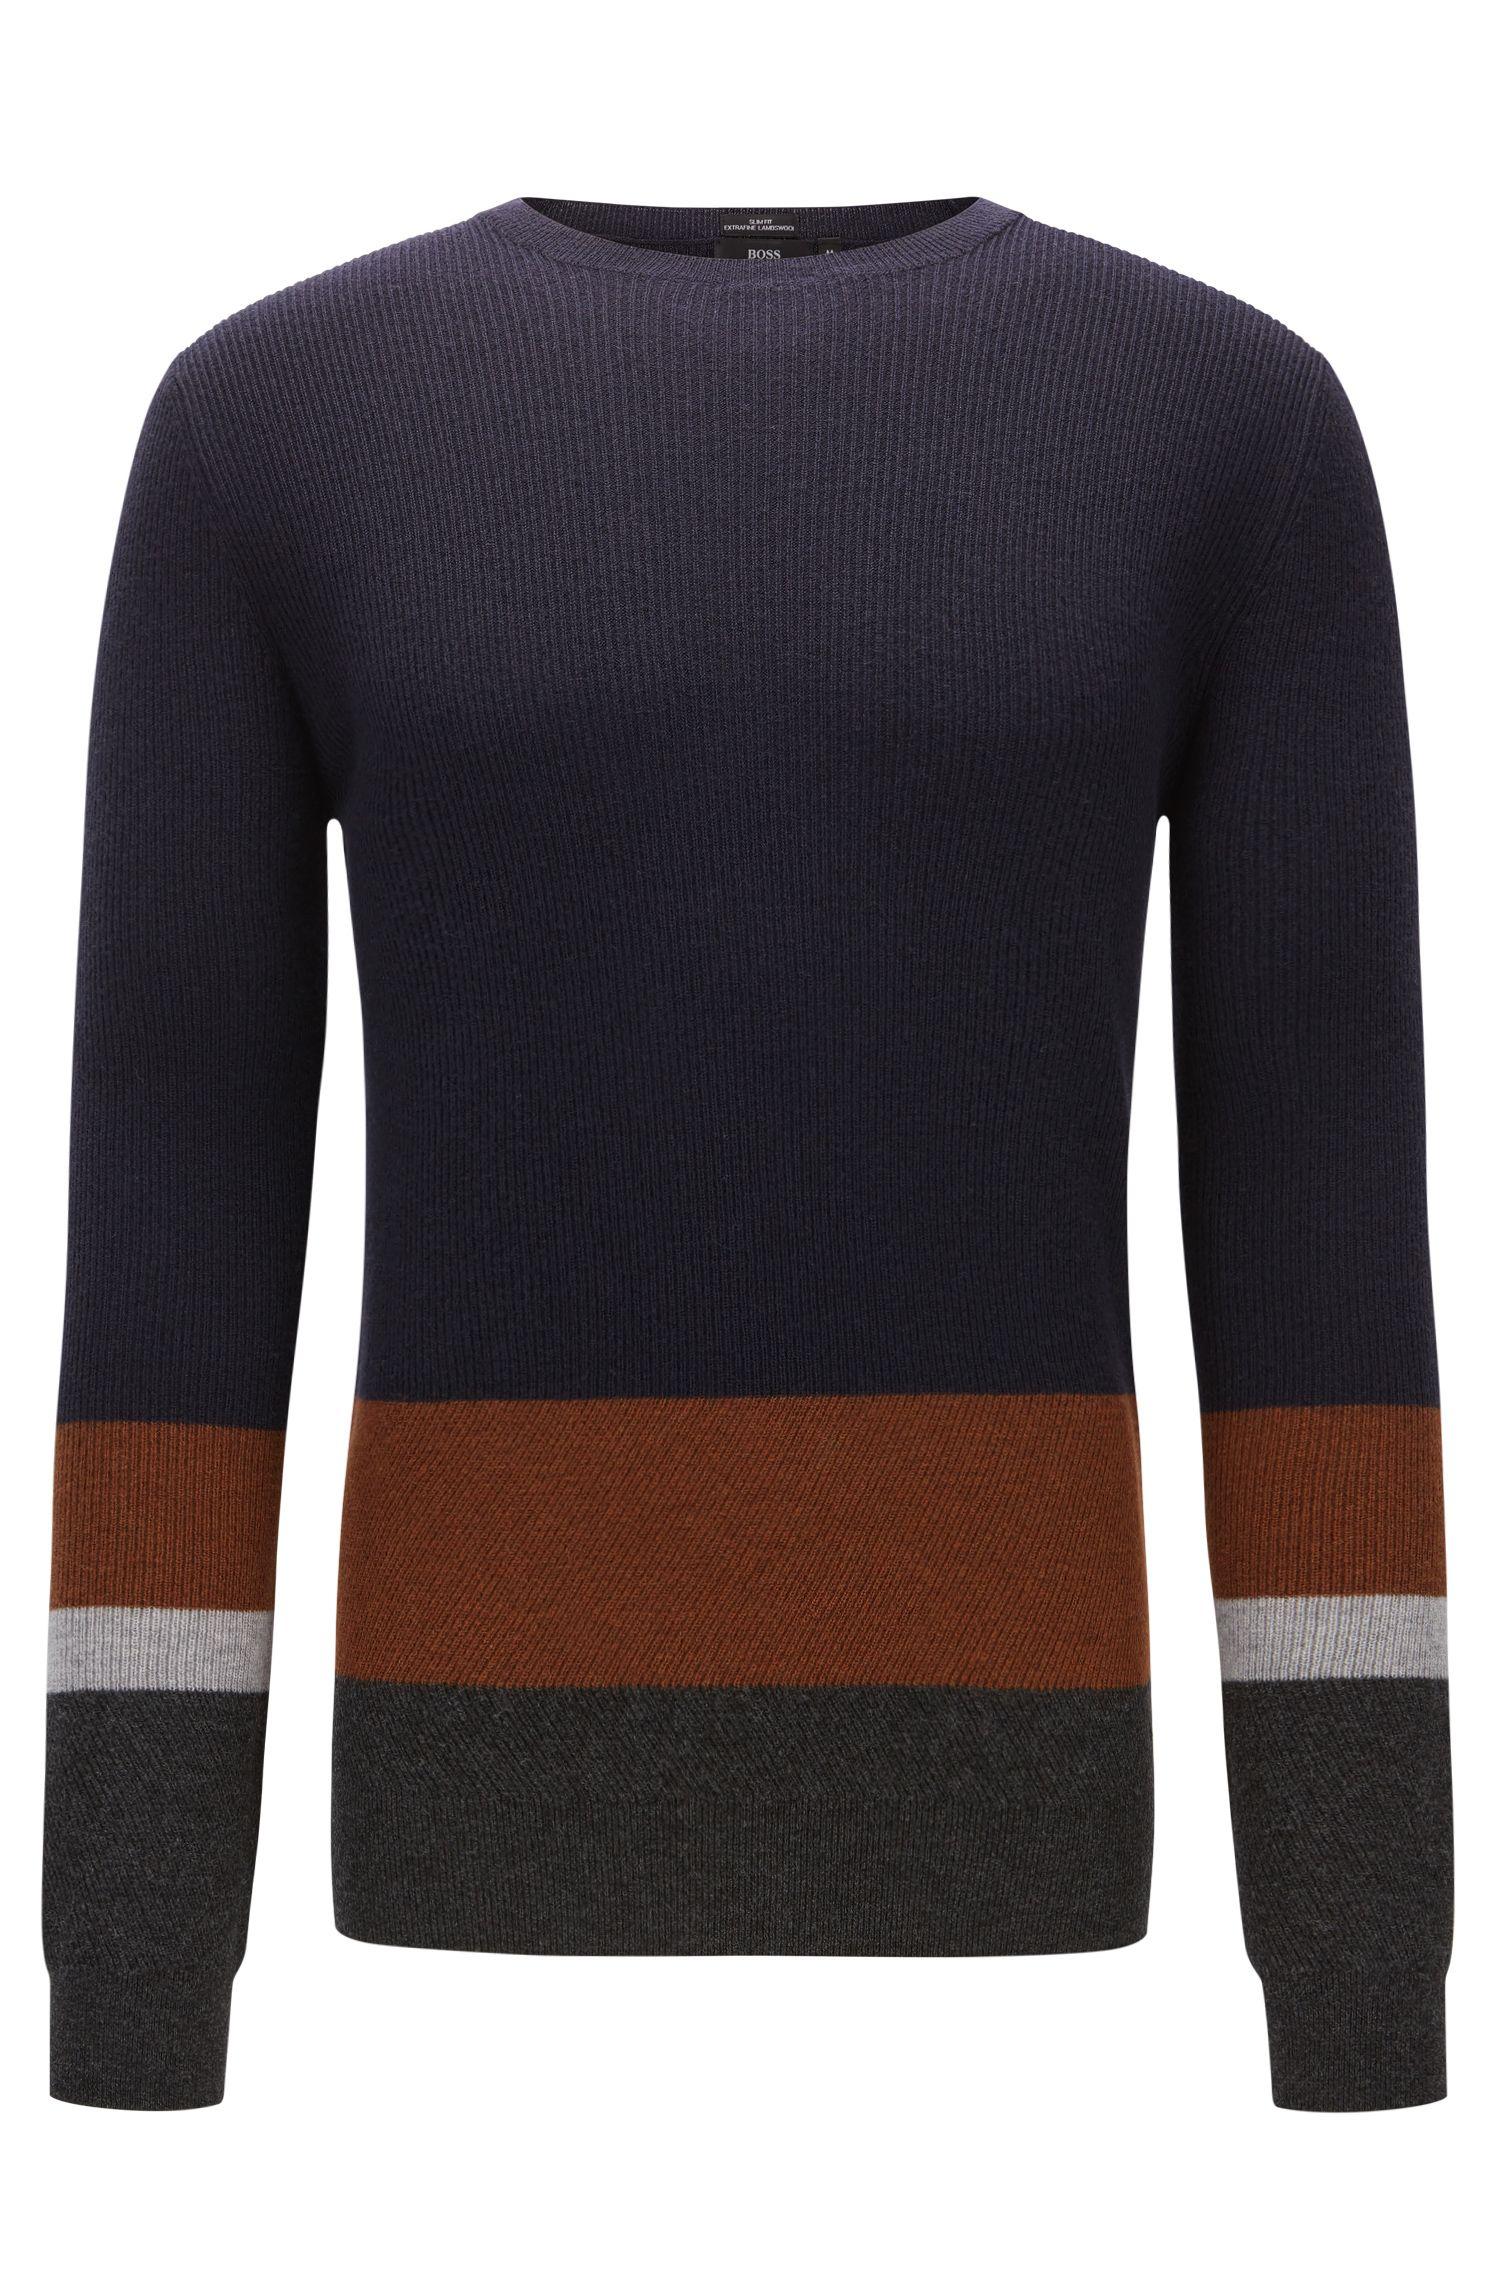 Maglione a blocchi di colore a coste in lana vergine